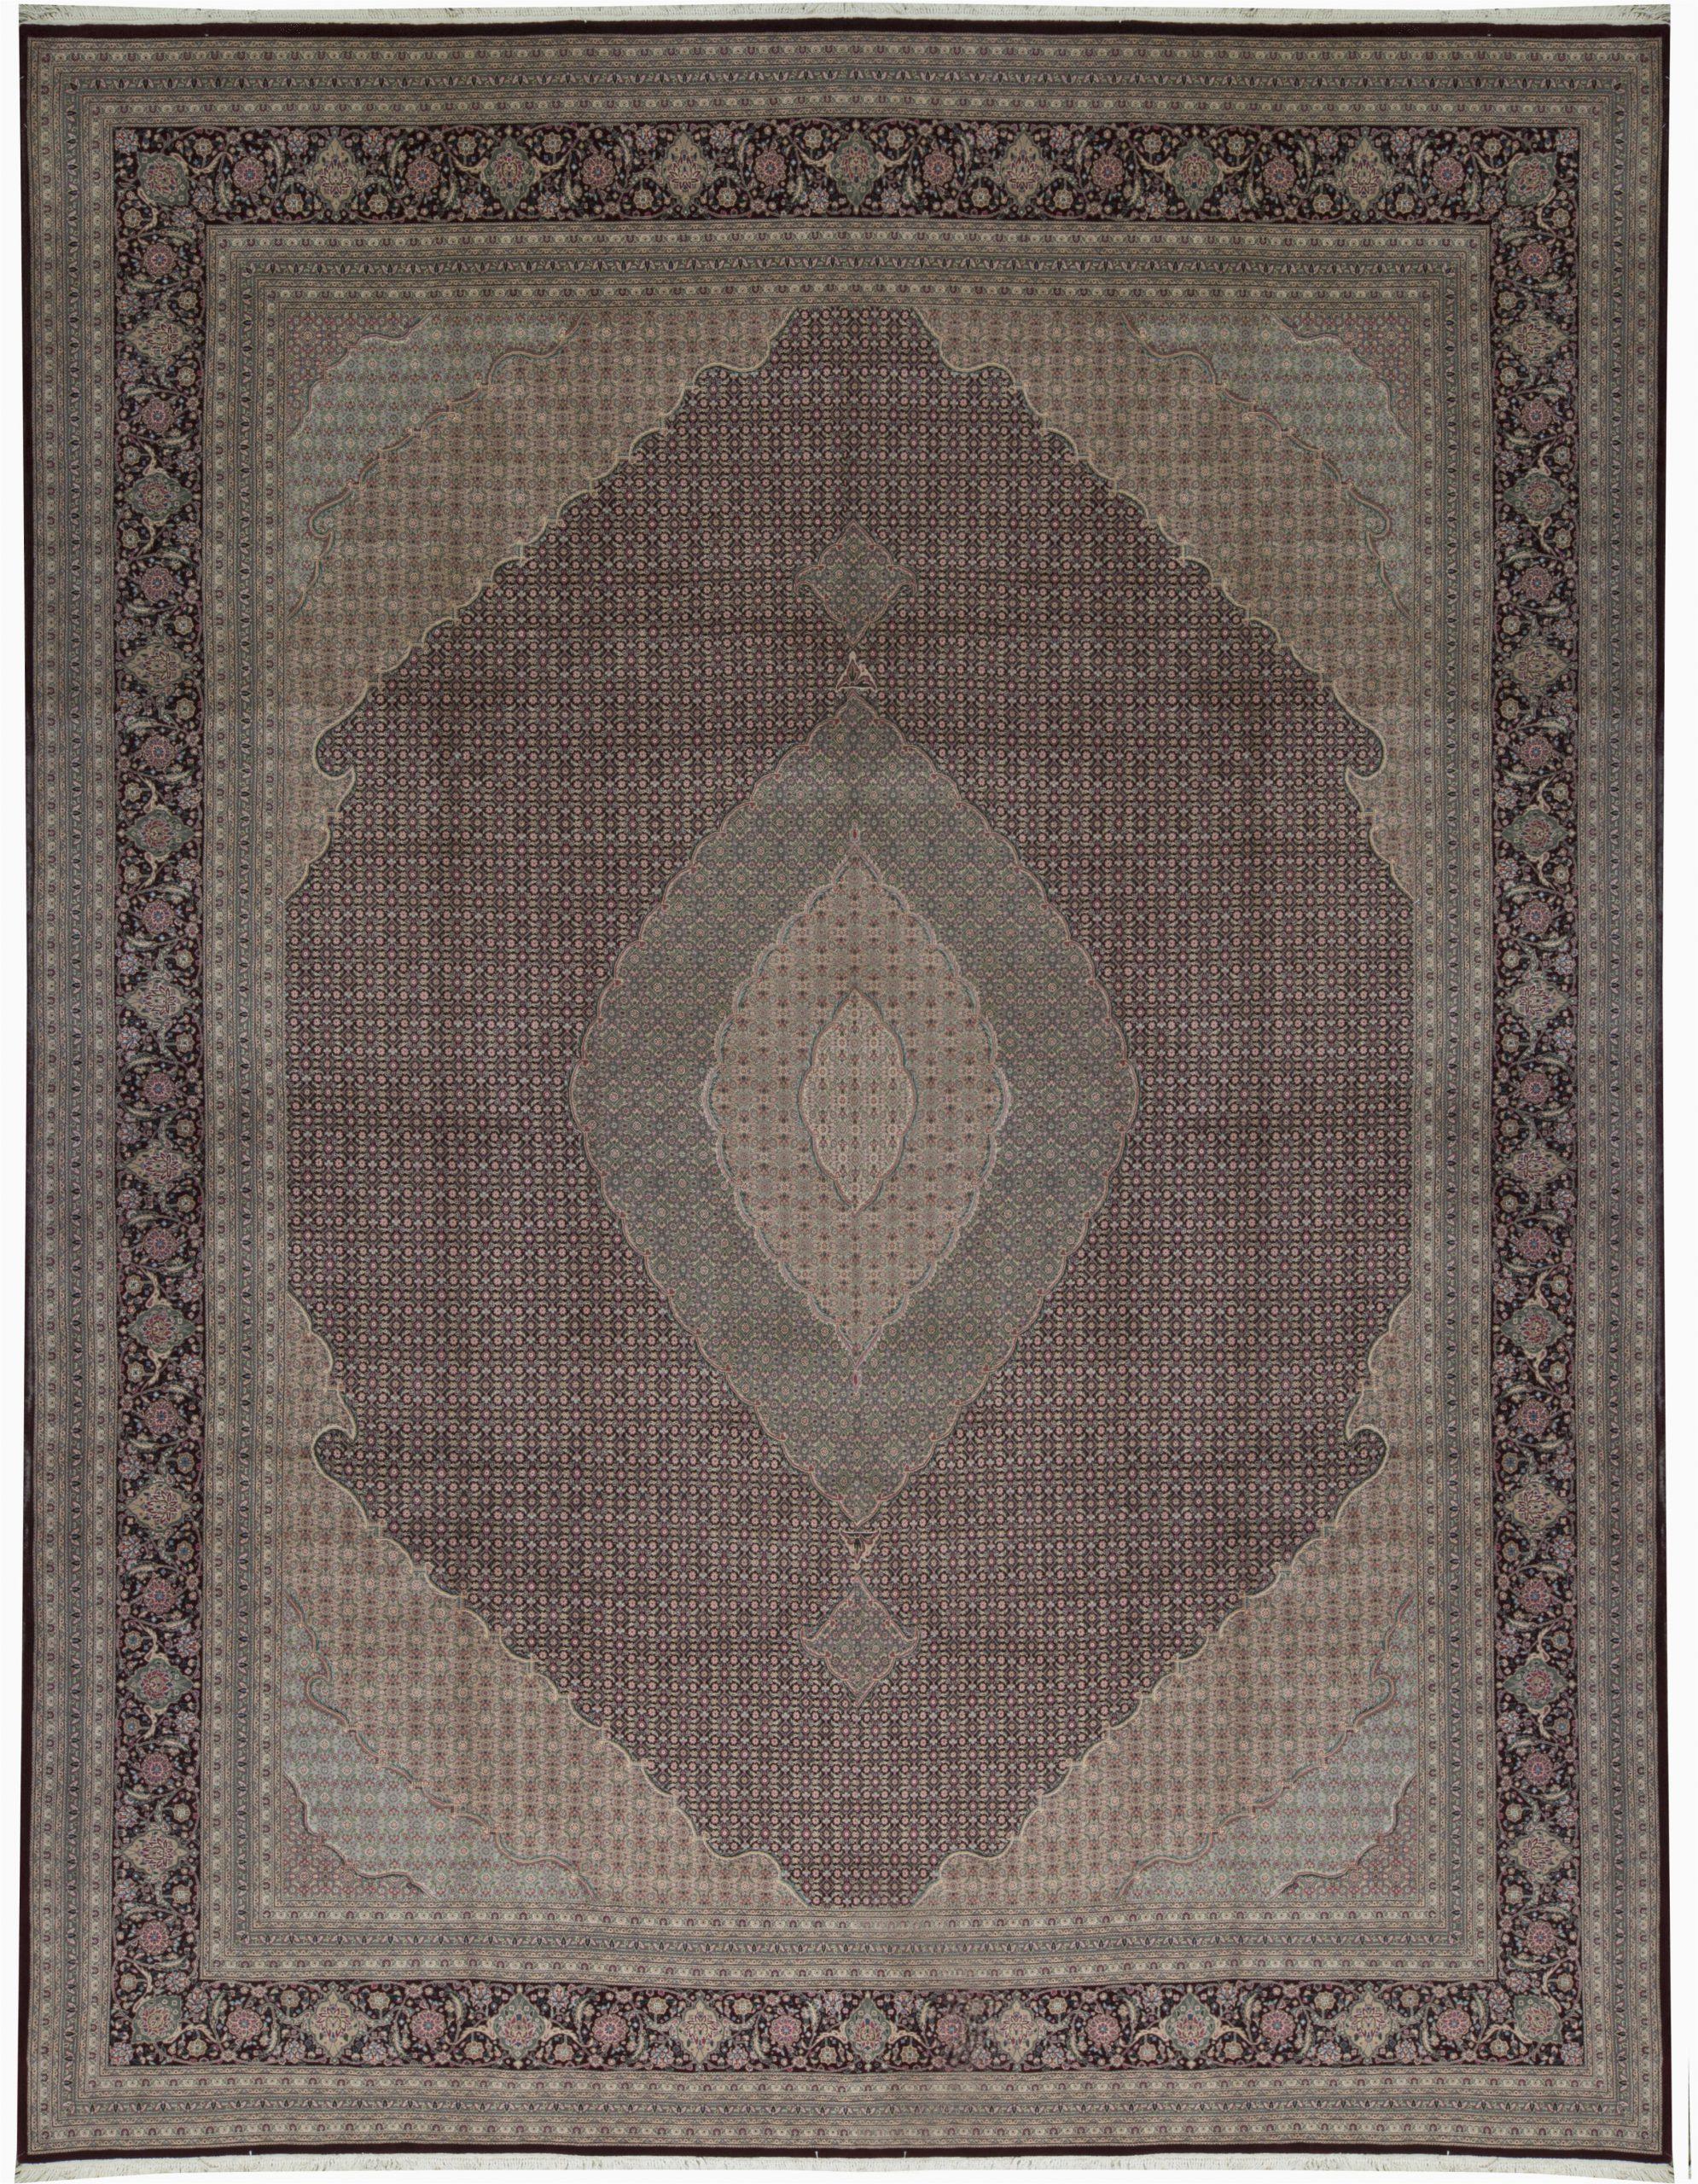 bokara rug co inc one of a kind hand knotted brown 15 x 119 runner wool area rug abhd4113